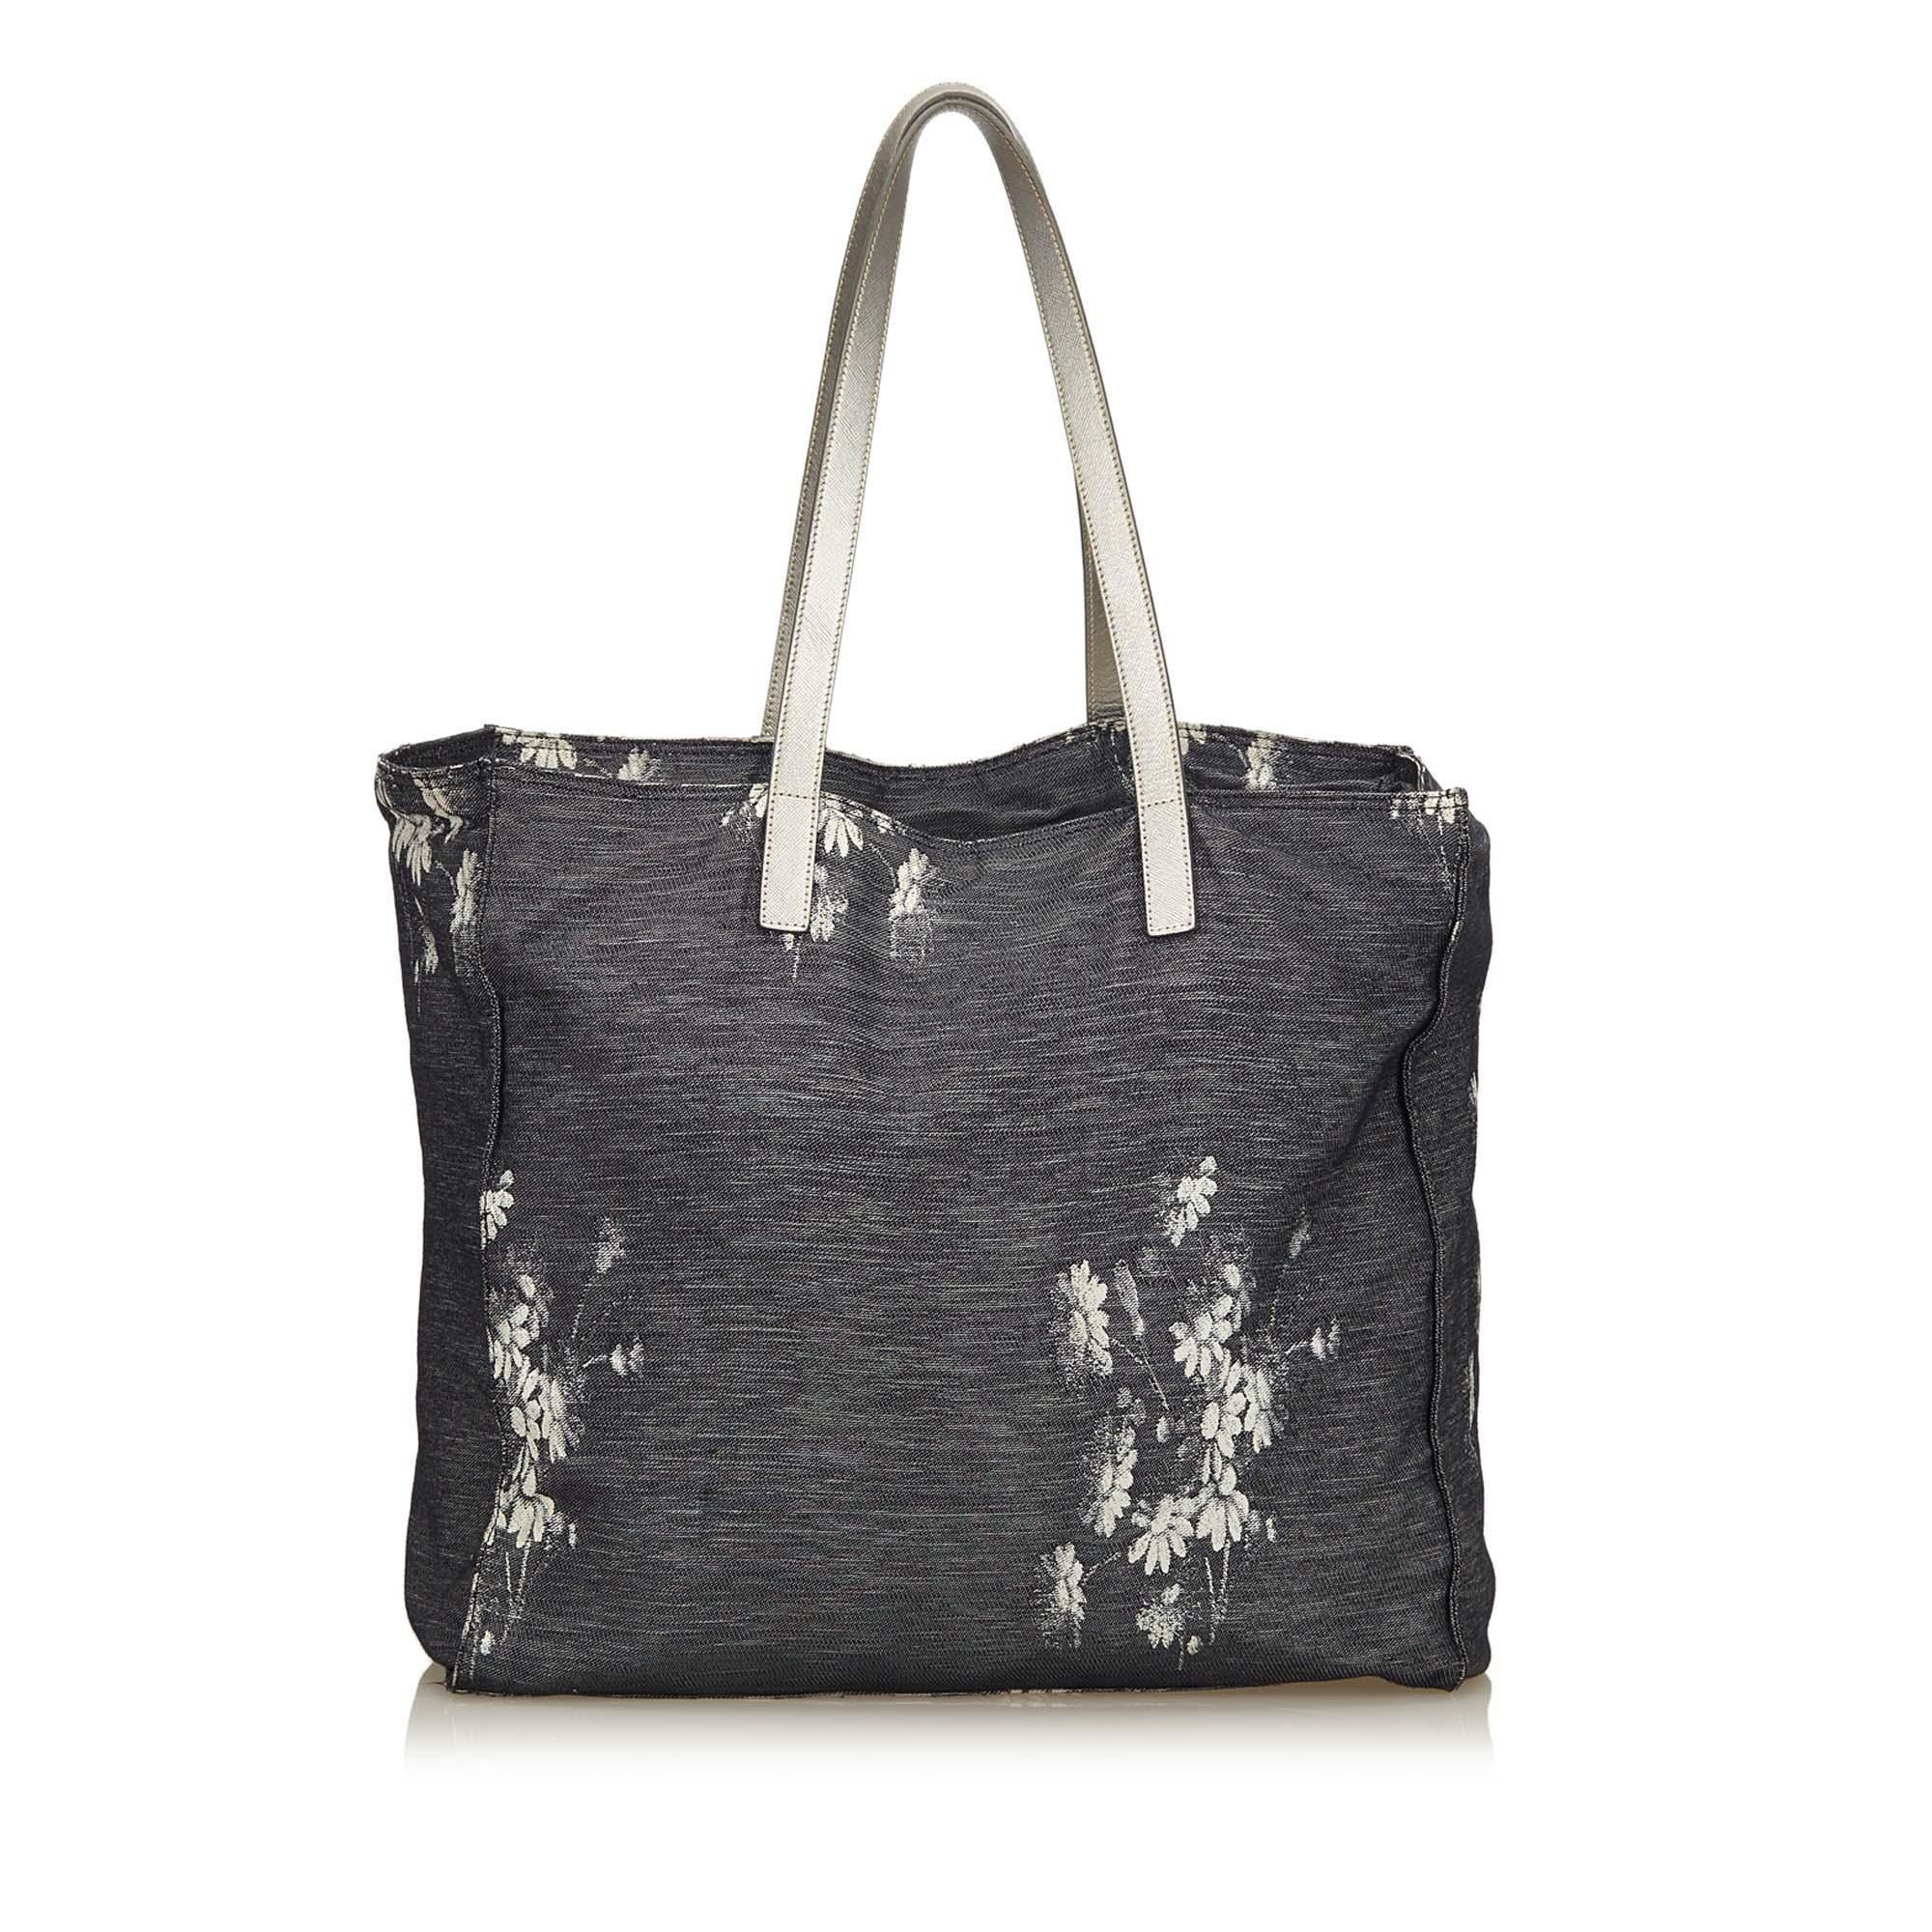 ... coupon black prada navy floral canvas tote bag for sale 8a3f3 a52c7  shopping prada tessuto ... 1194b3a251238